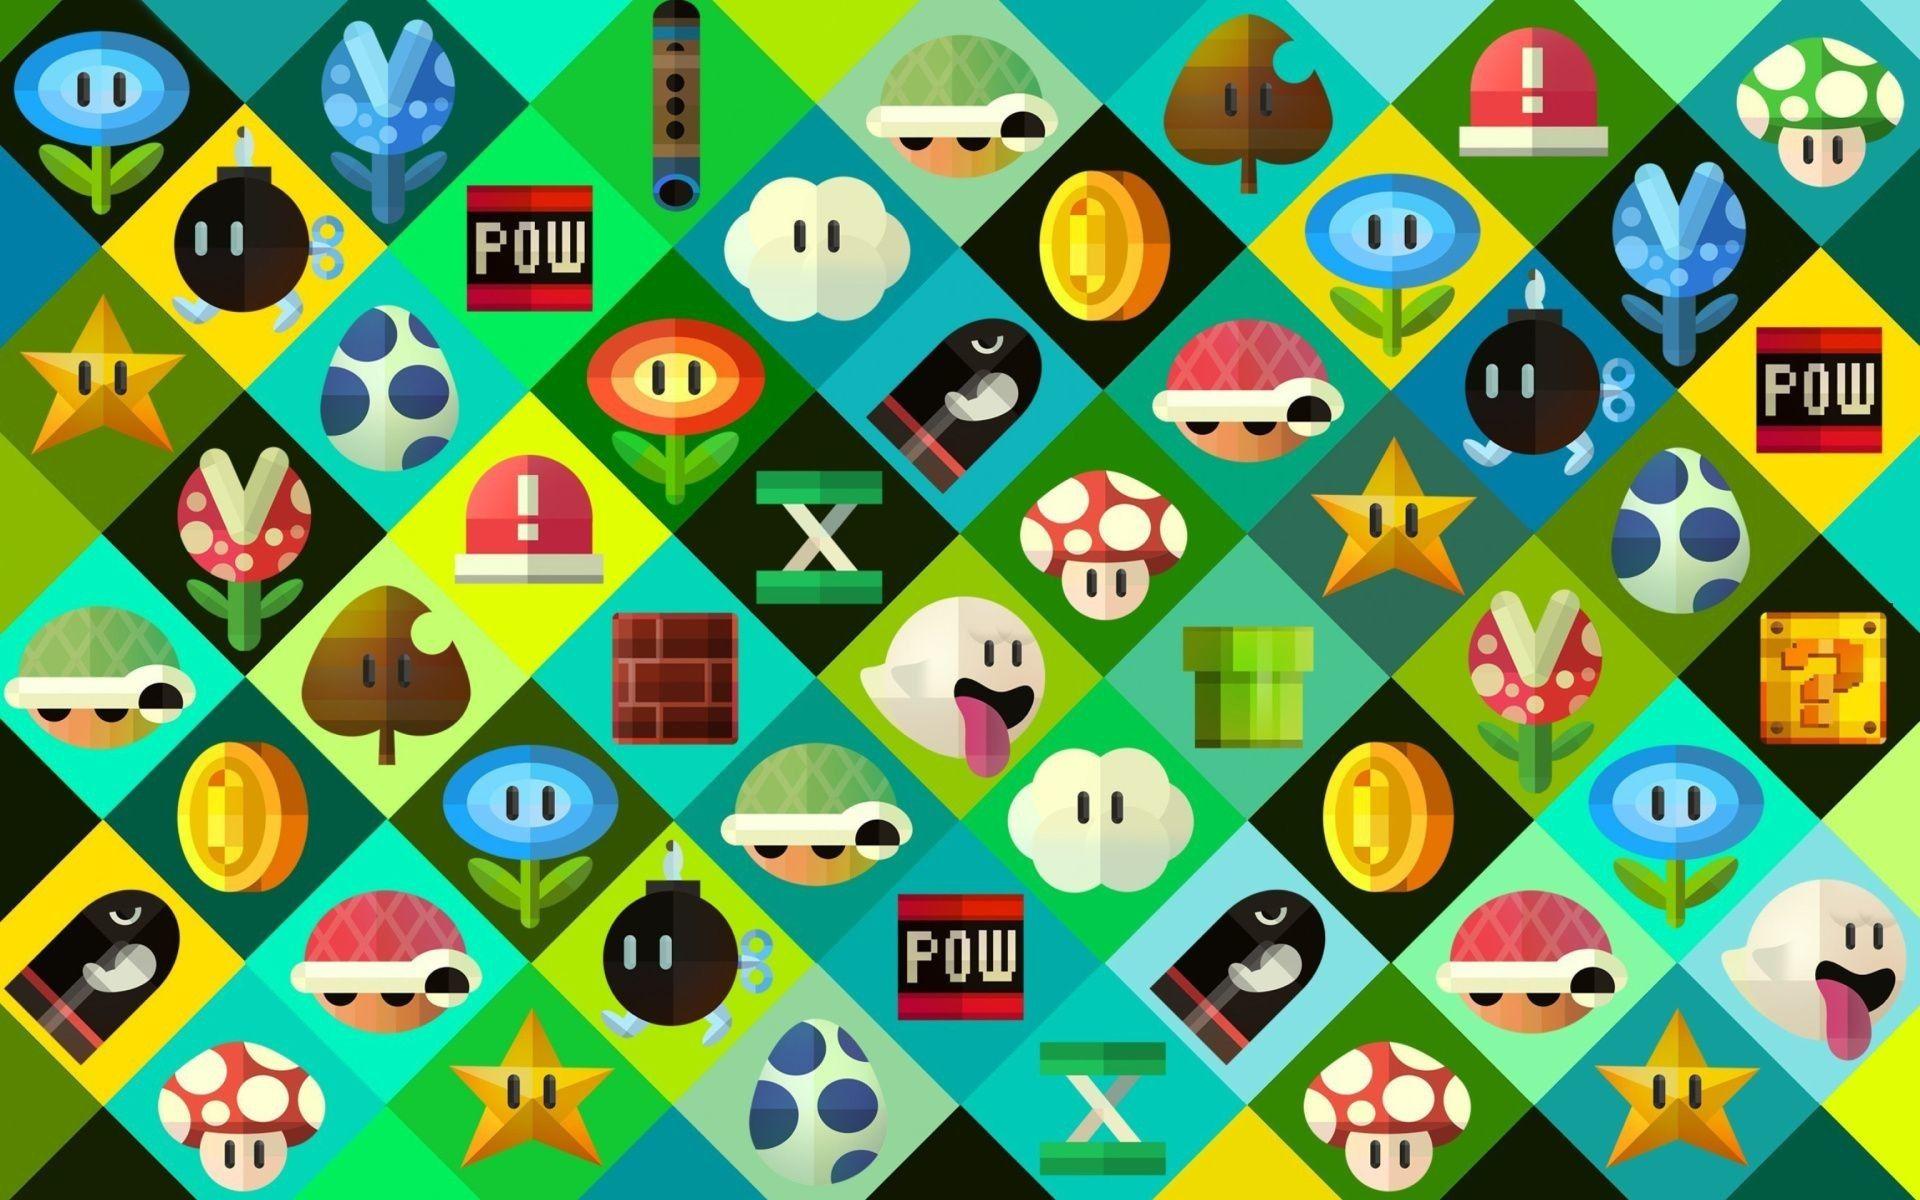 71 Nintendo Desktop Wallpapers On Wallpaperplay Game Art Wallpaper Print Pictures